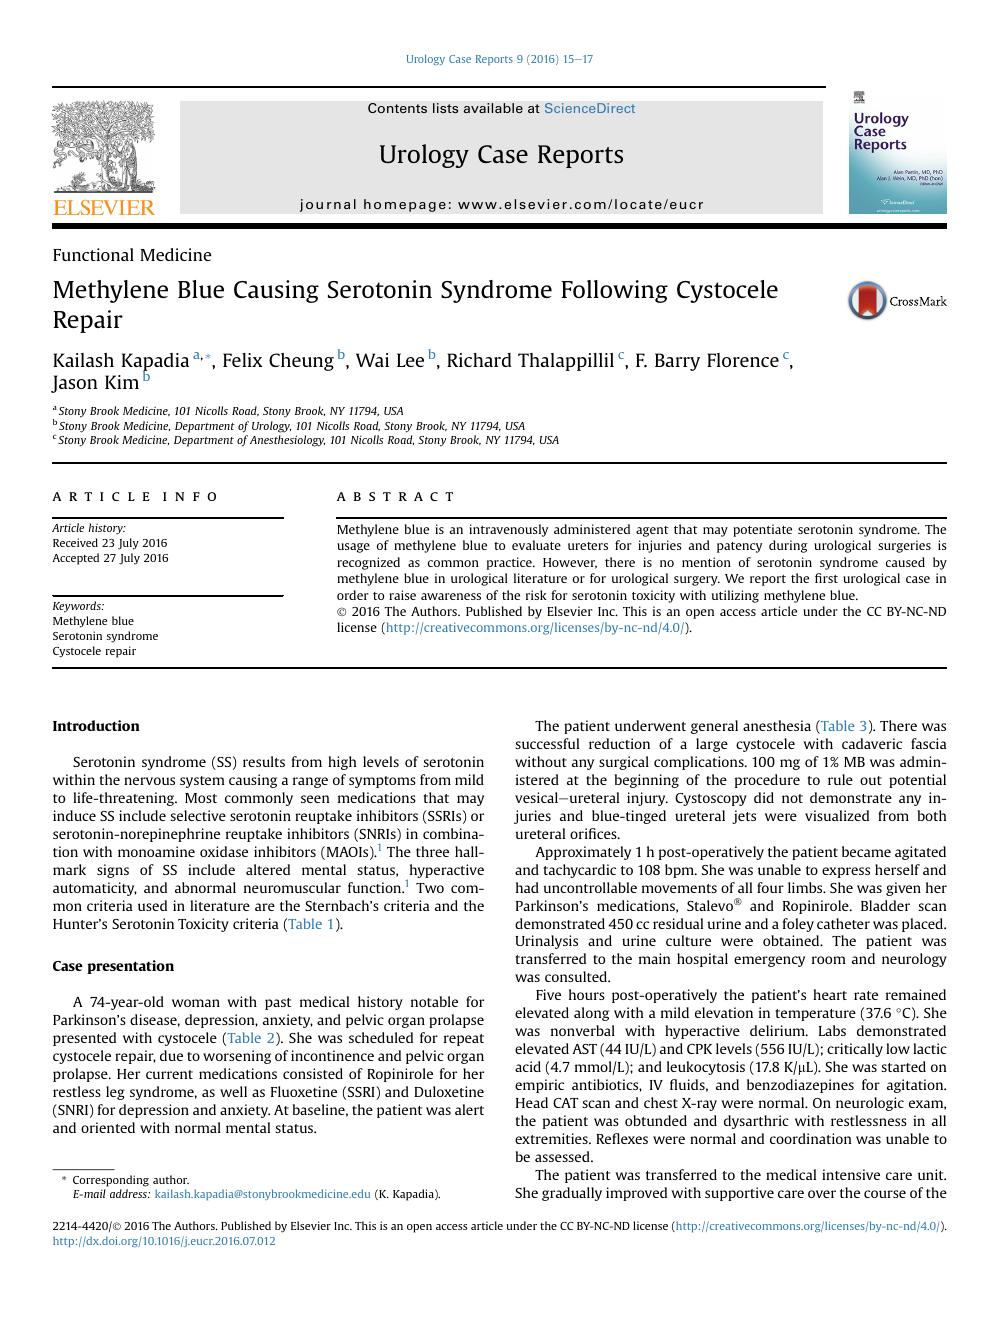 Methylene Blue Causing Serotonin Syndrome Following Cystocele Repair